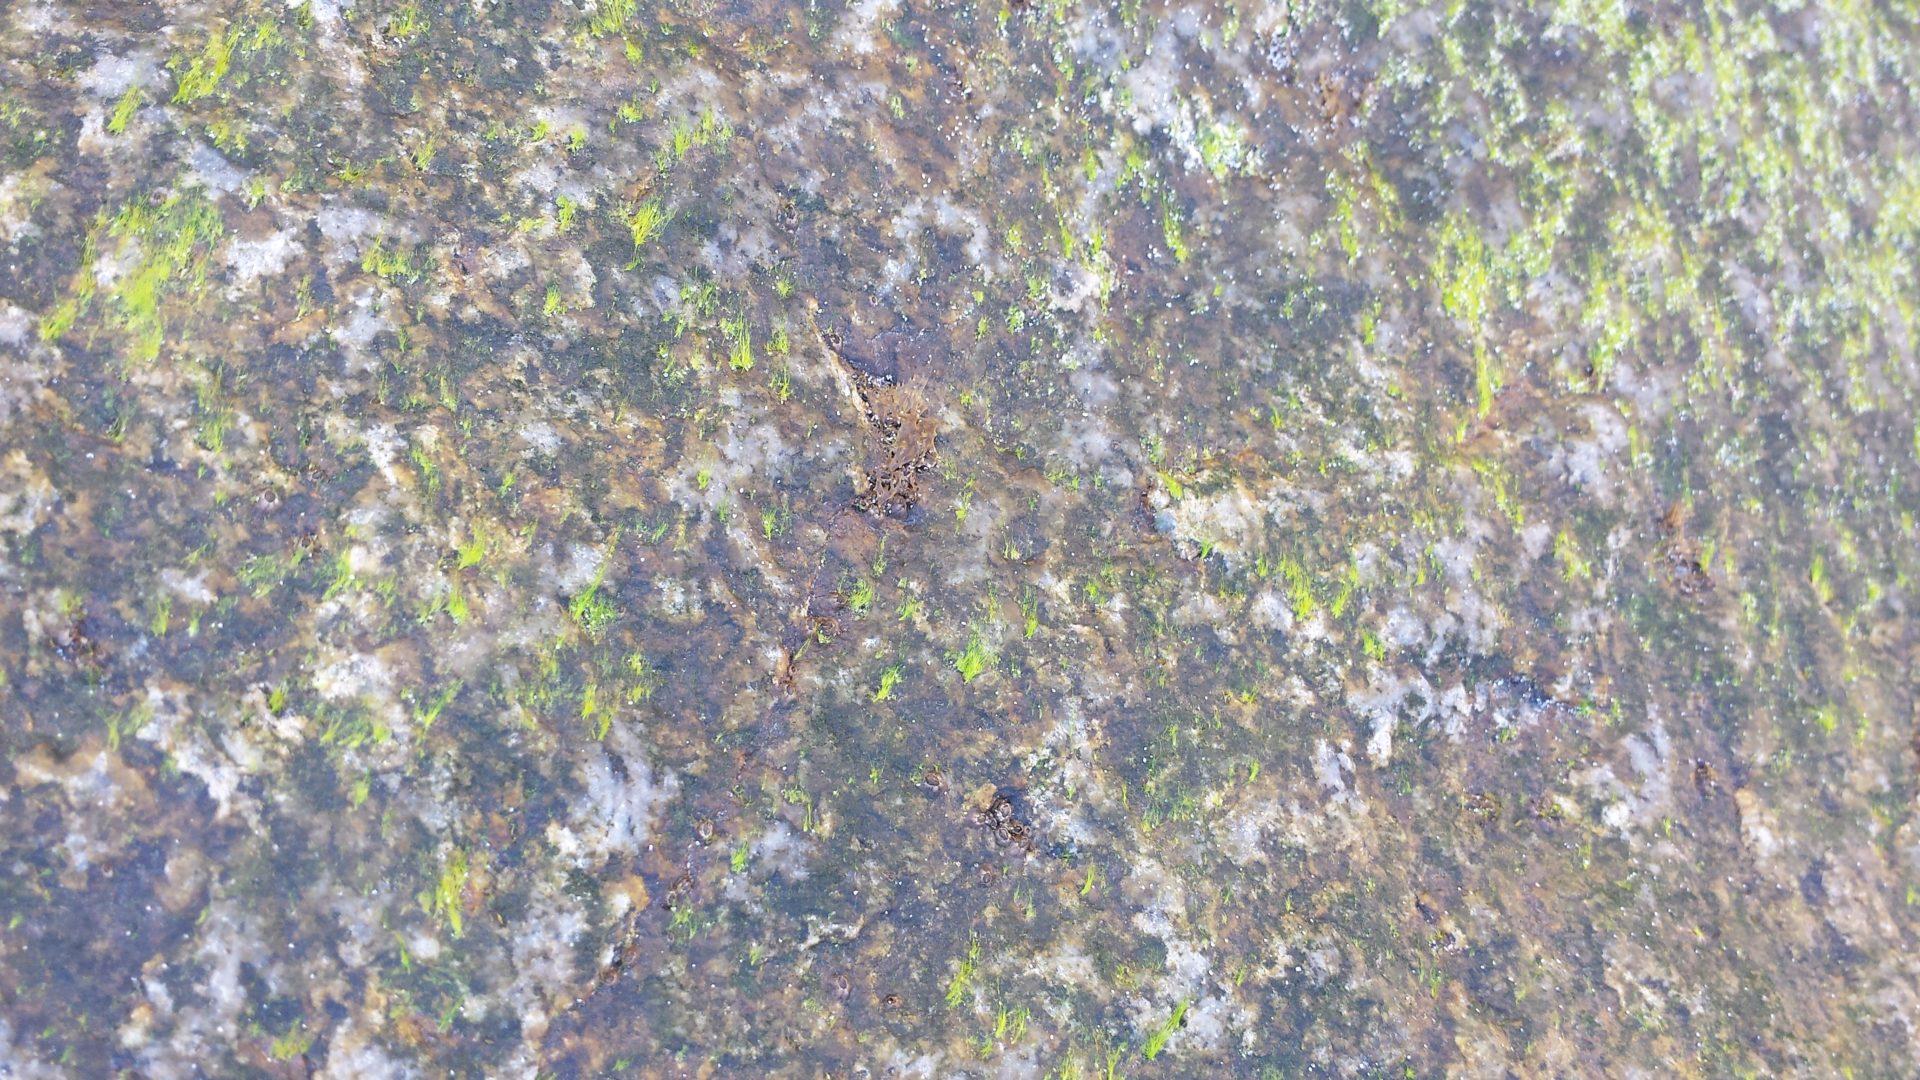 Nature's Pollock